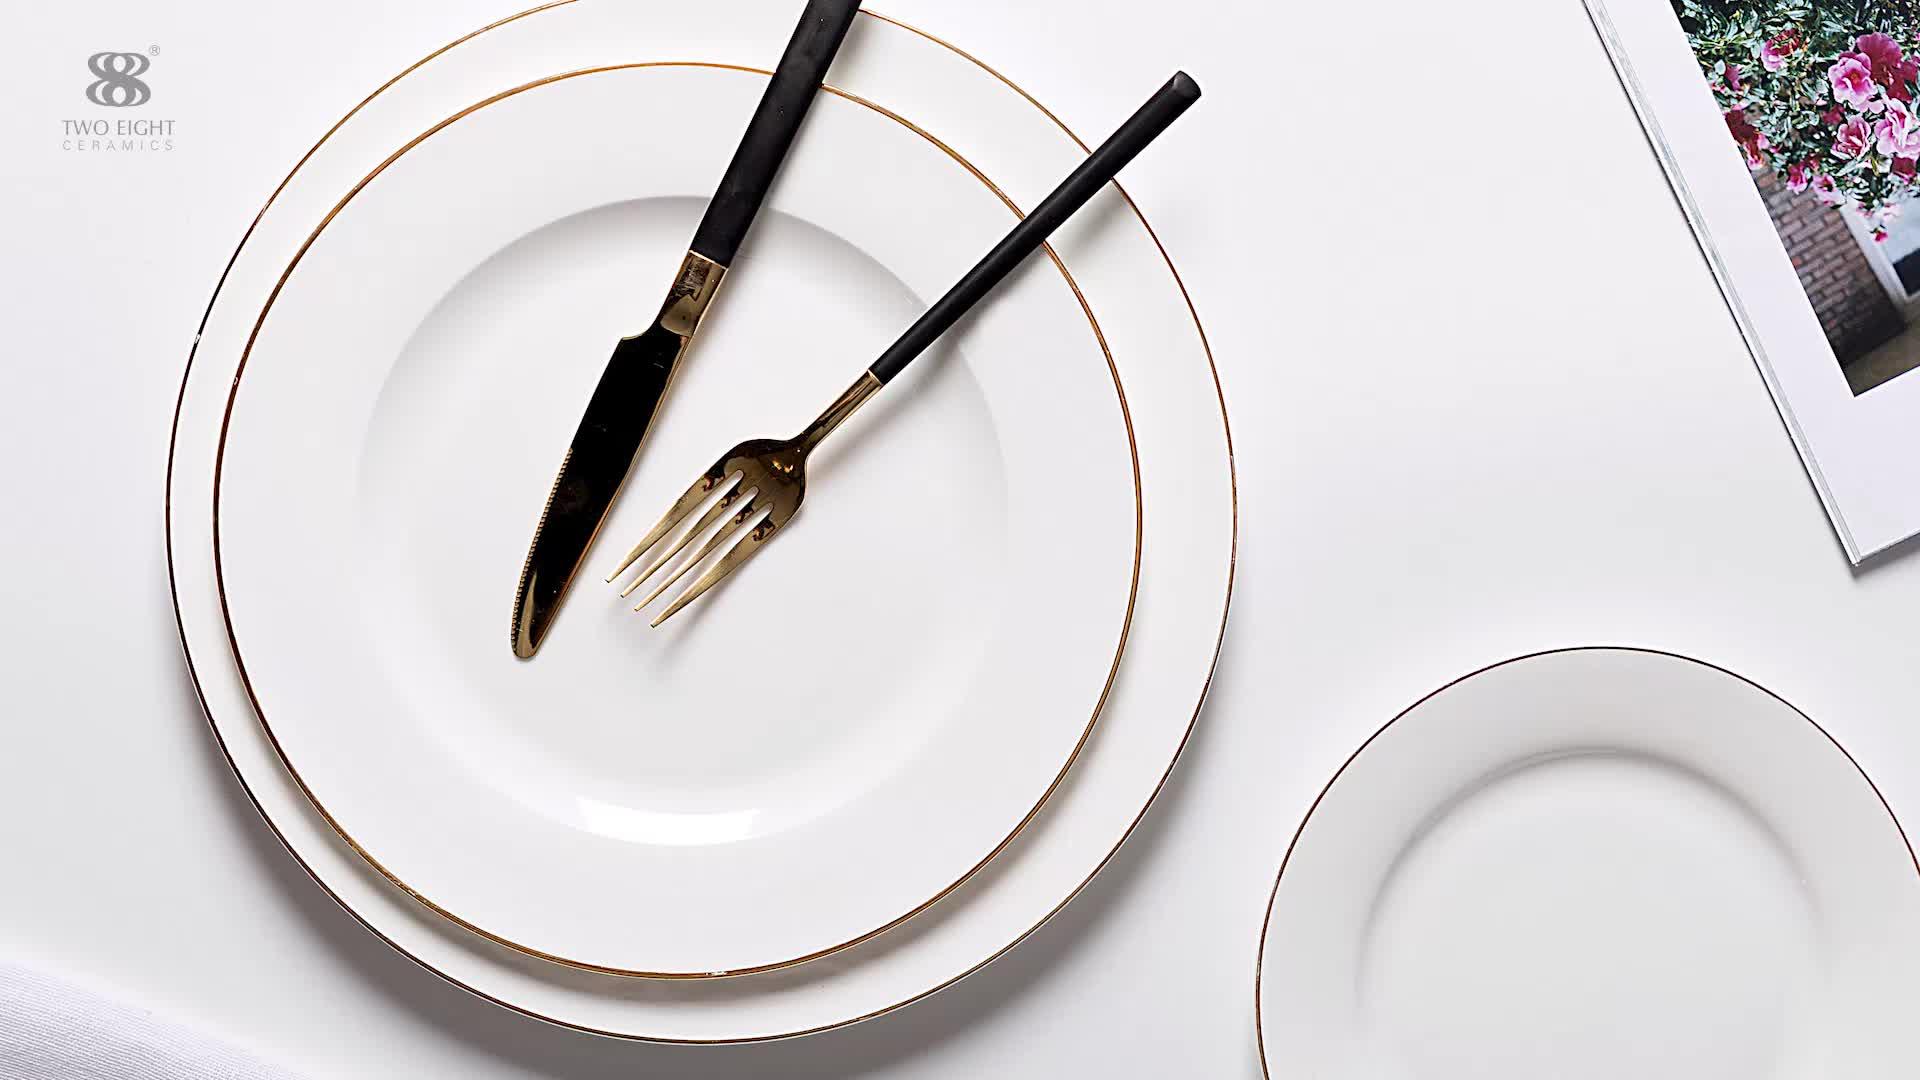 Hotel Restaurant Wedding Catering Bone China Dinner Plate, gold rim luxury dish